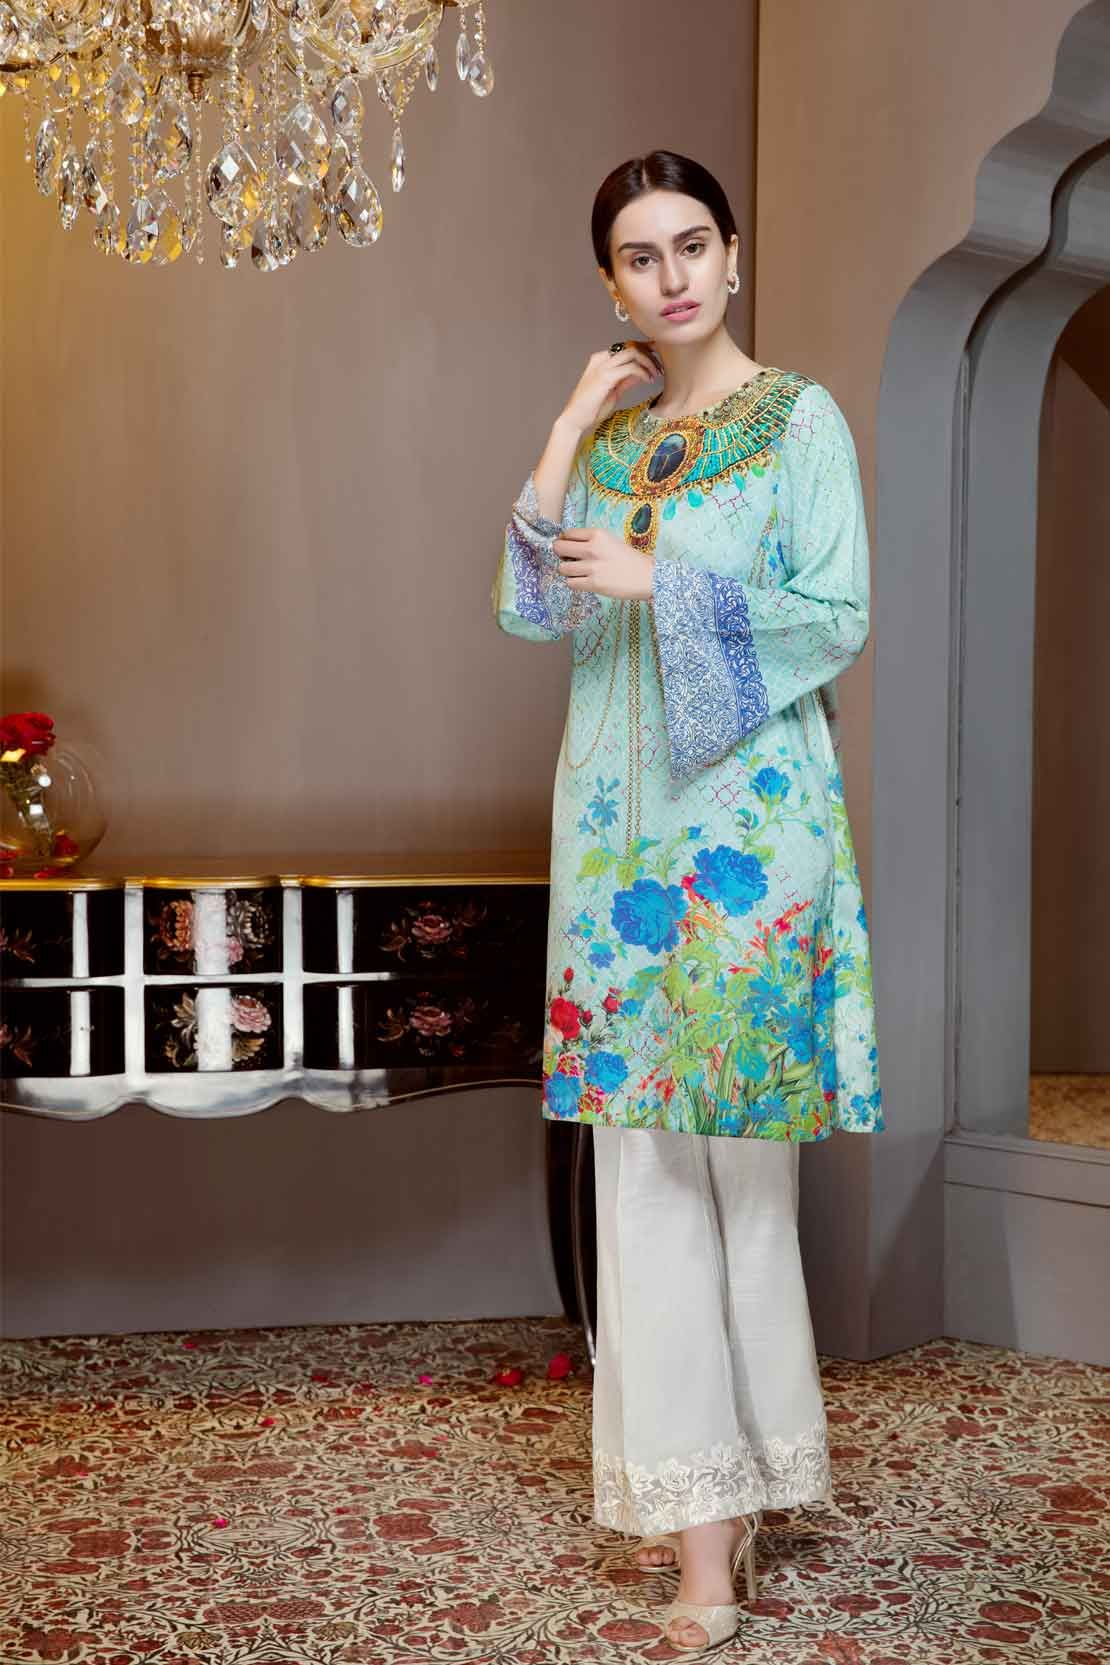 Beautiful blue Pakistani unstitched dress by Limelight printed